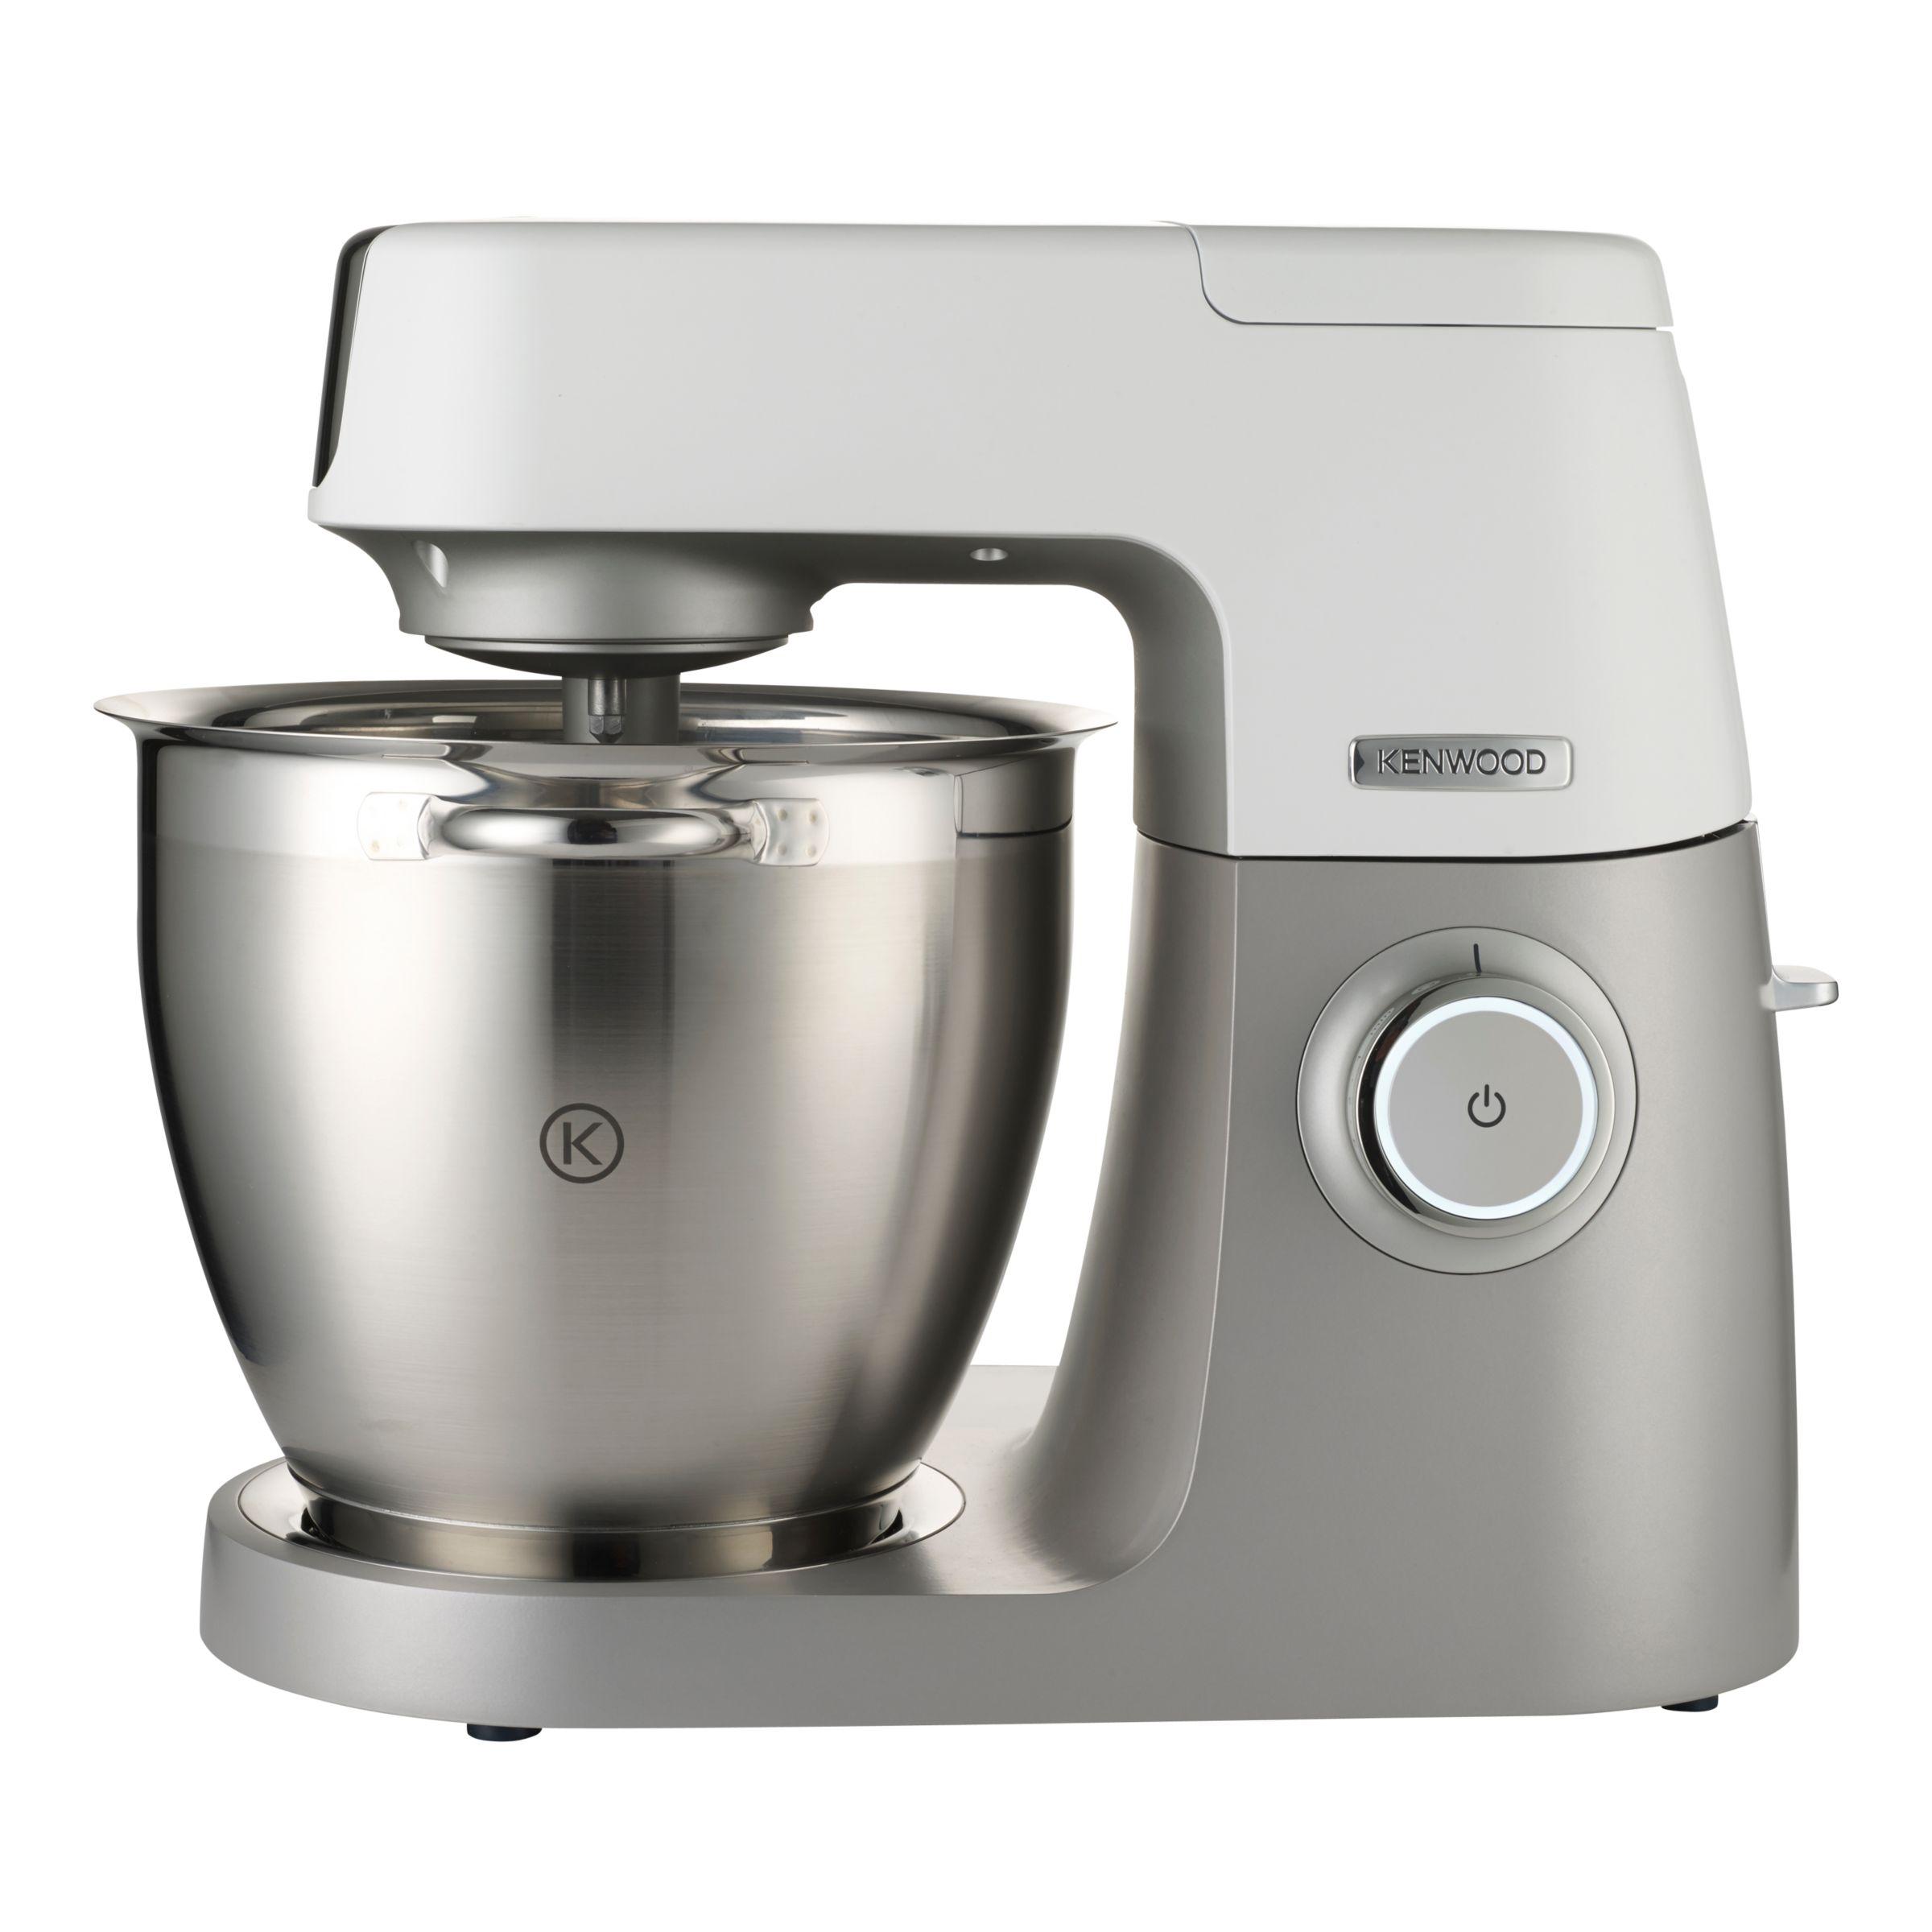 Buy Kenwood KVL6000 Chef Sense XL Stand Mixer White